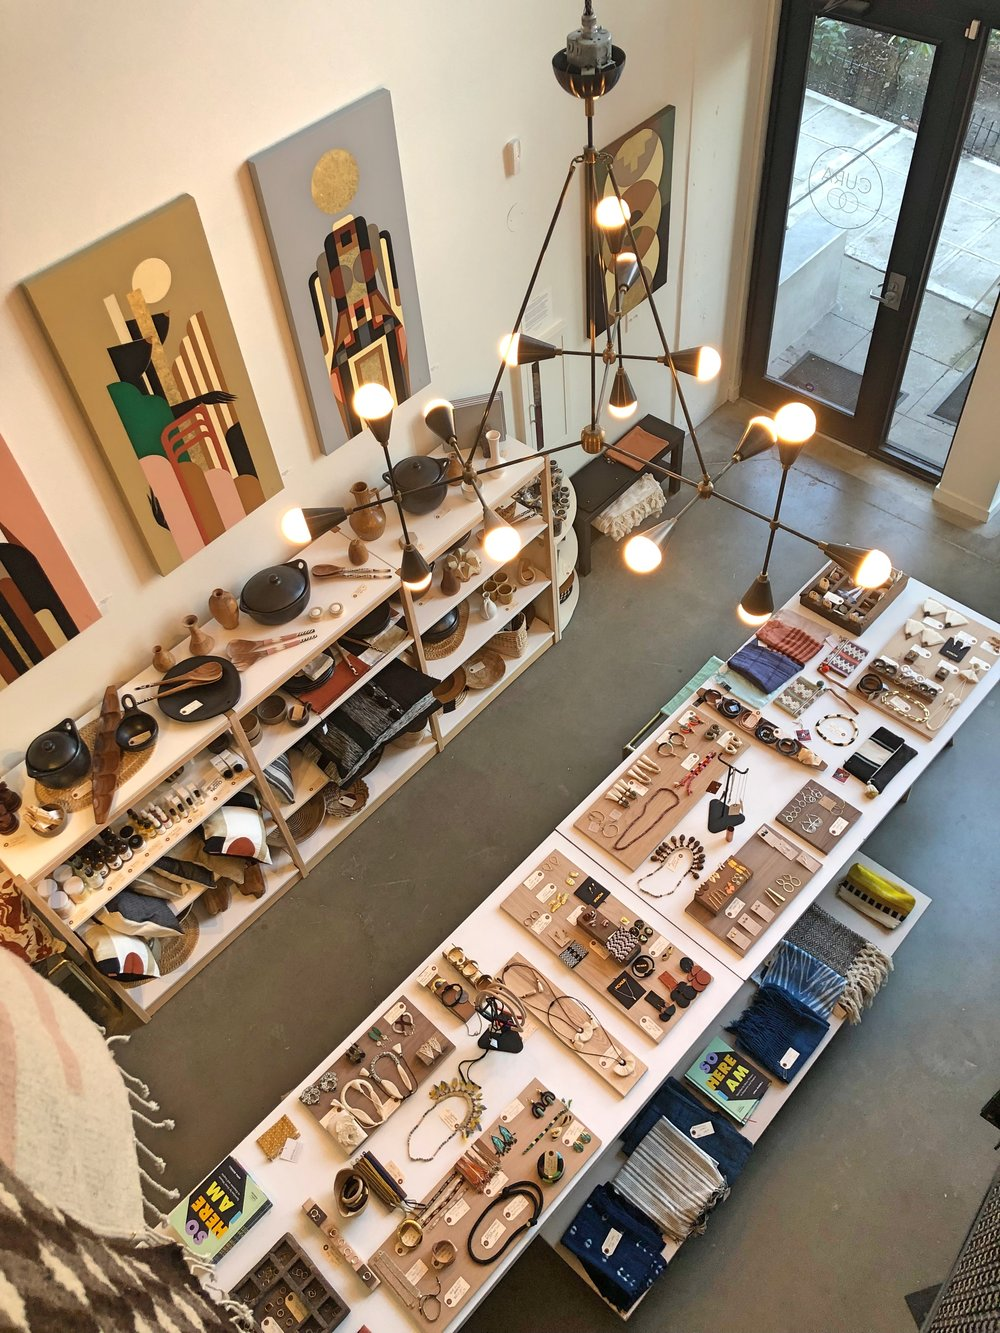 Cura Gallery - Photo Courtesy of AKiko Eisner-Waters